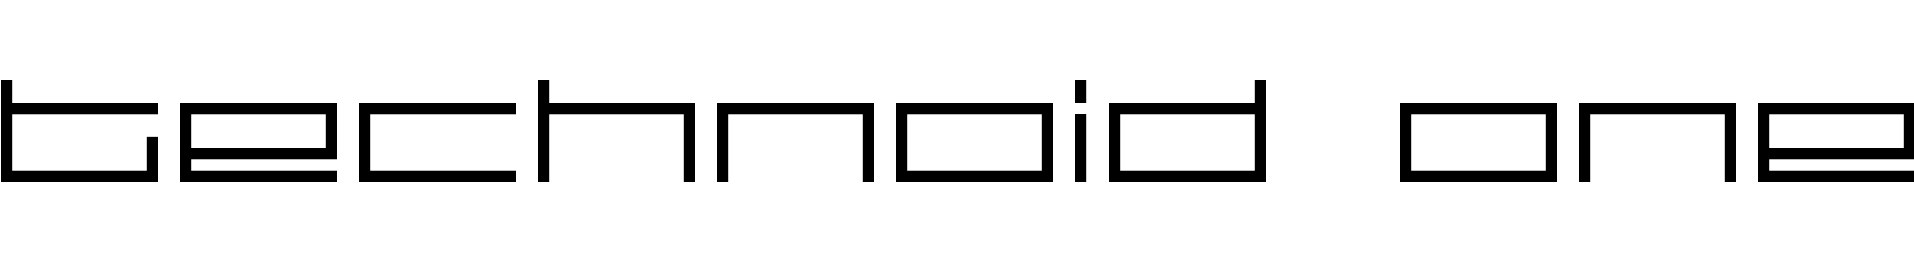 technoid one